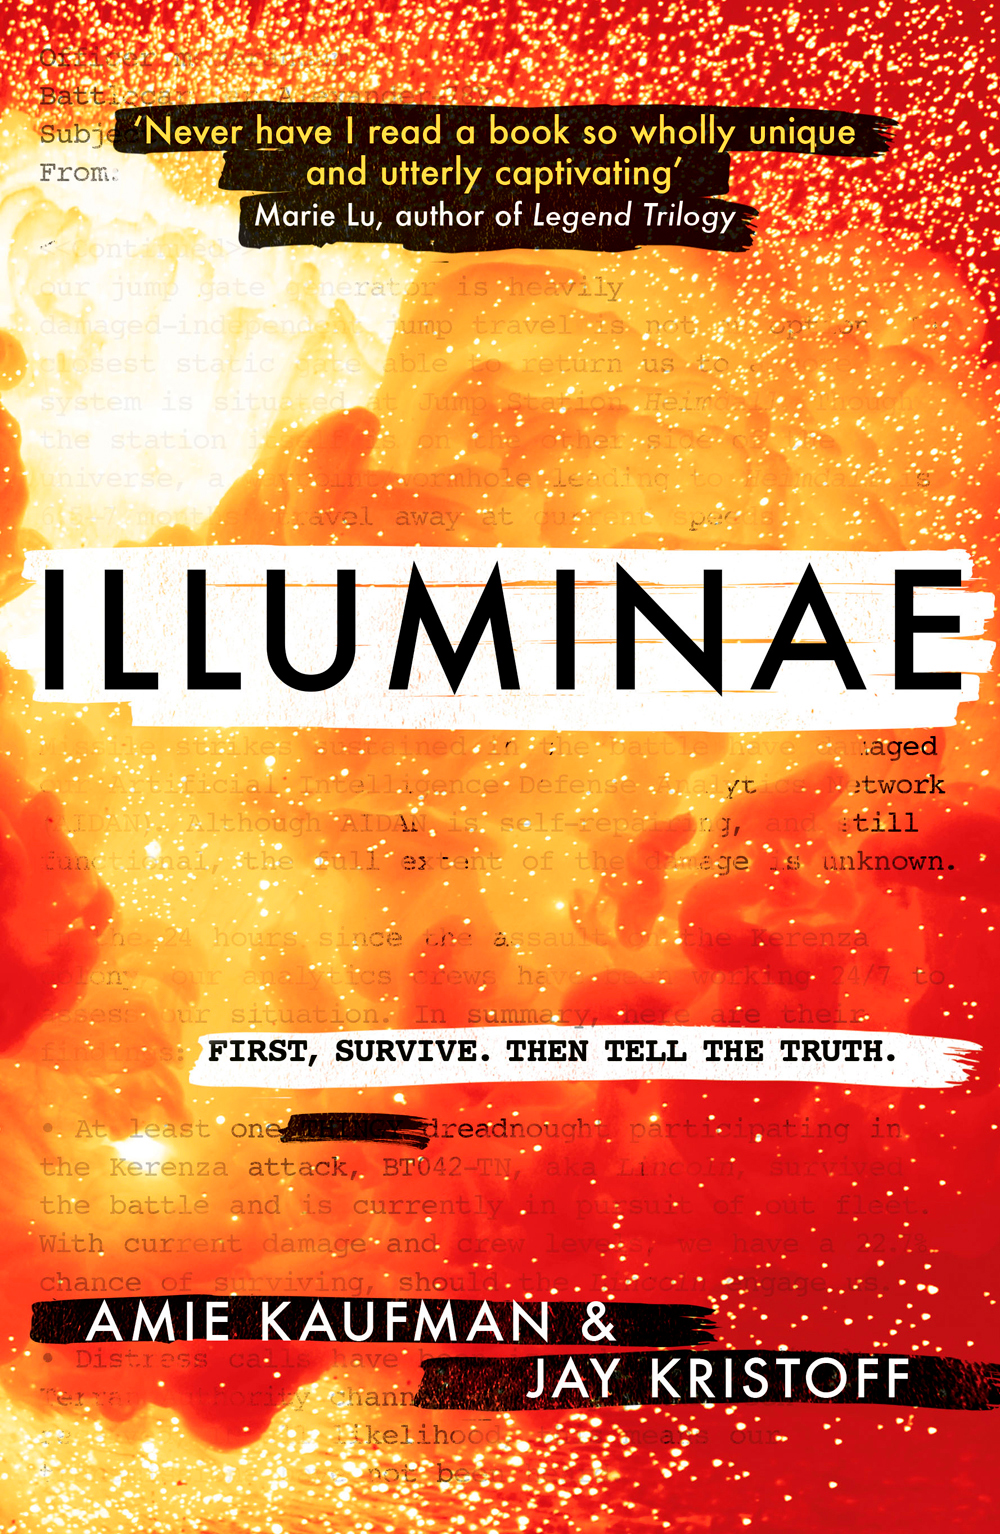 Illuminae (Amie Kaufman & Jay Kristoff)